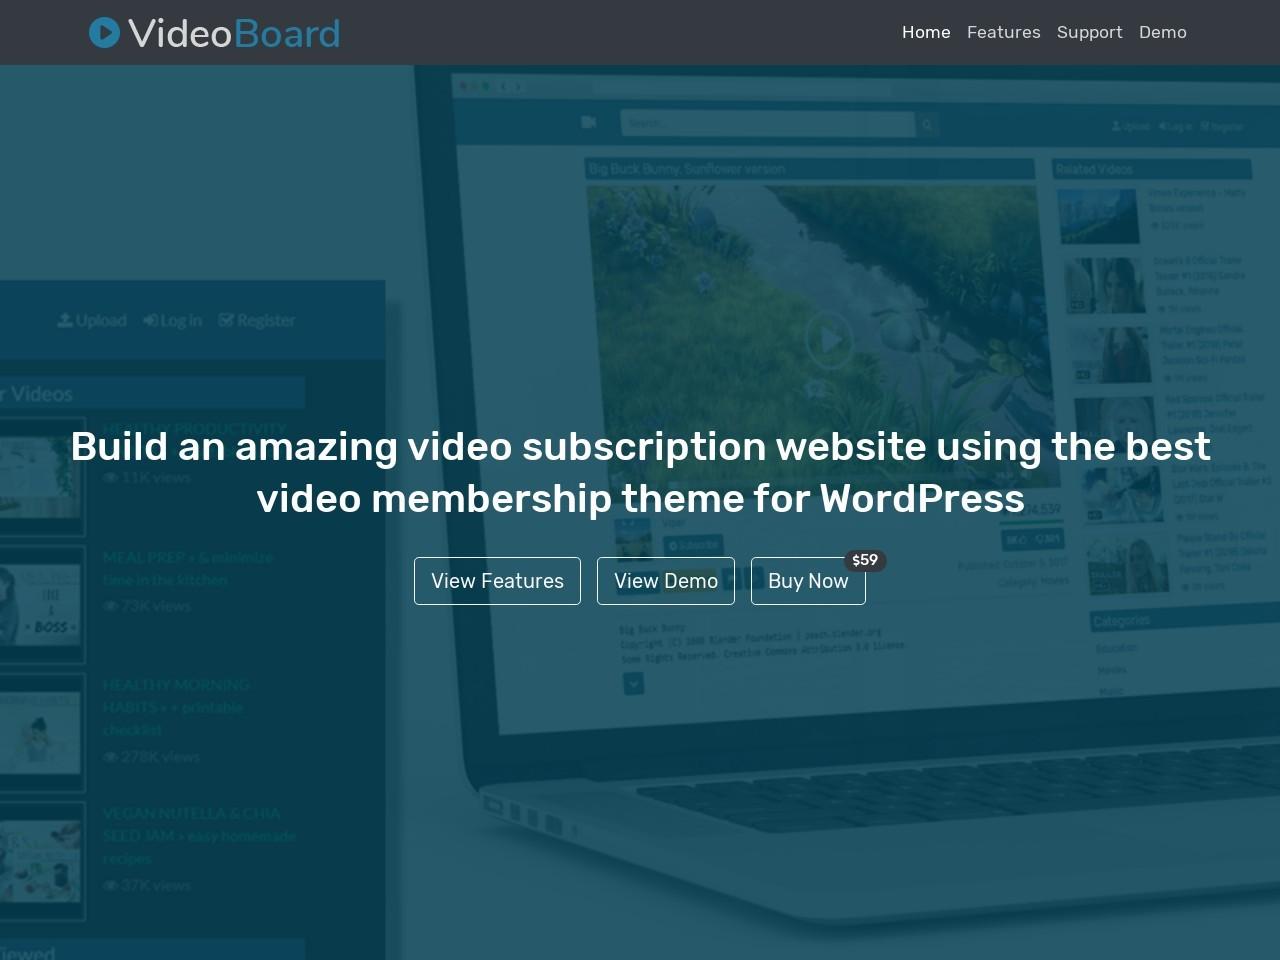 VideoBoard